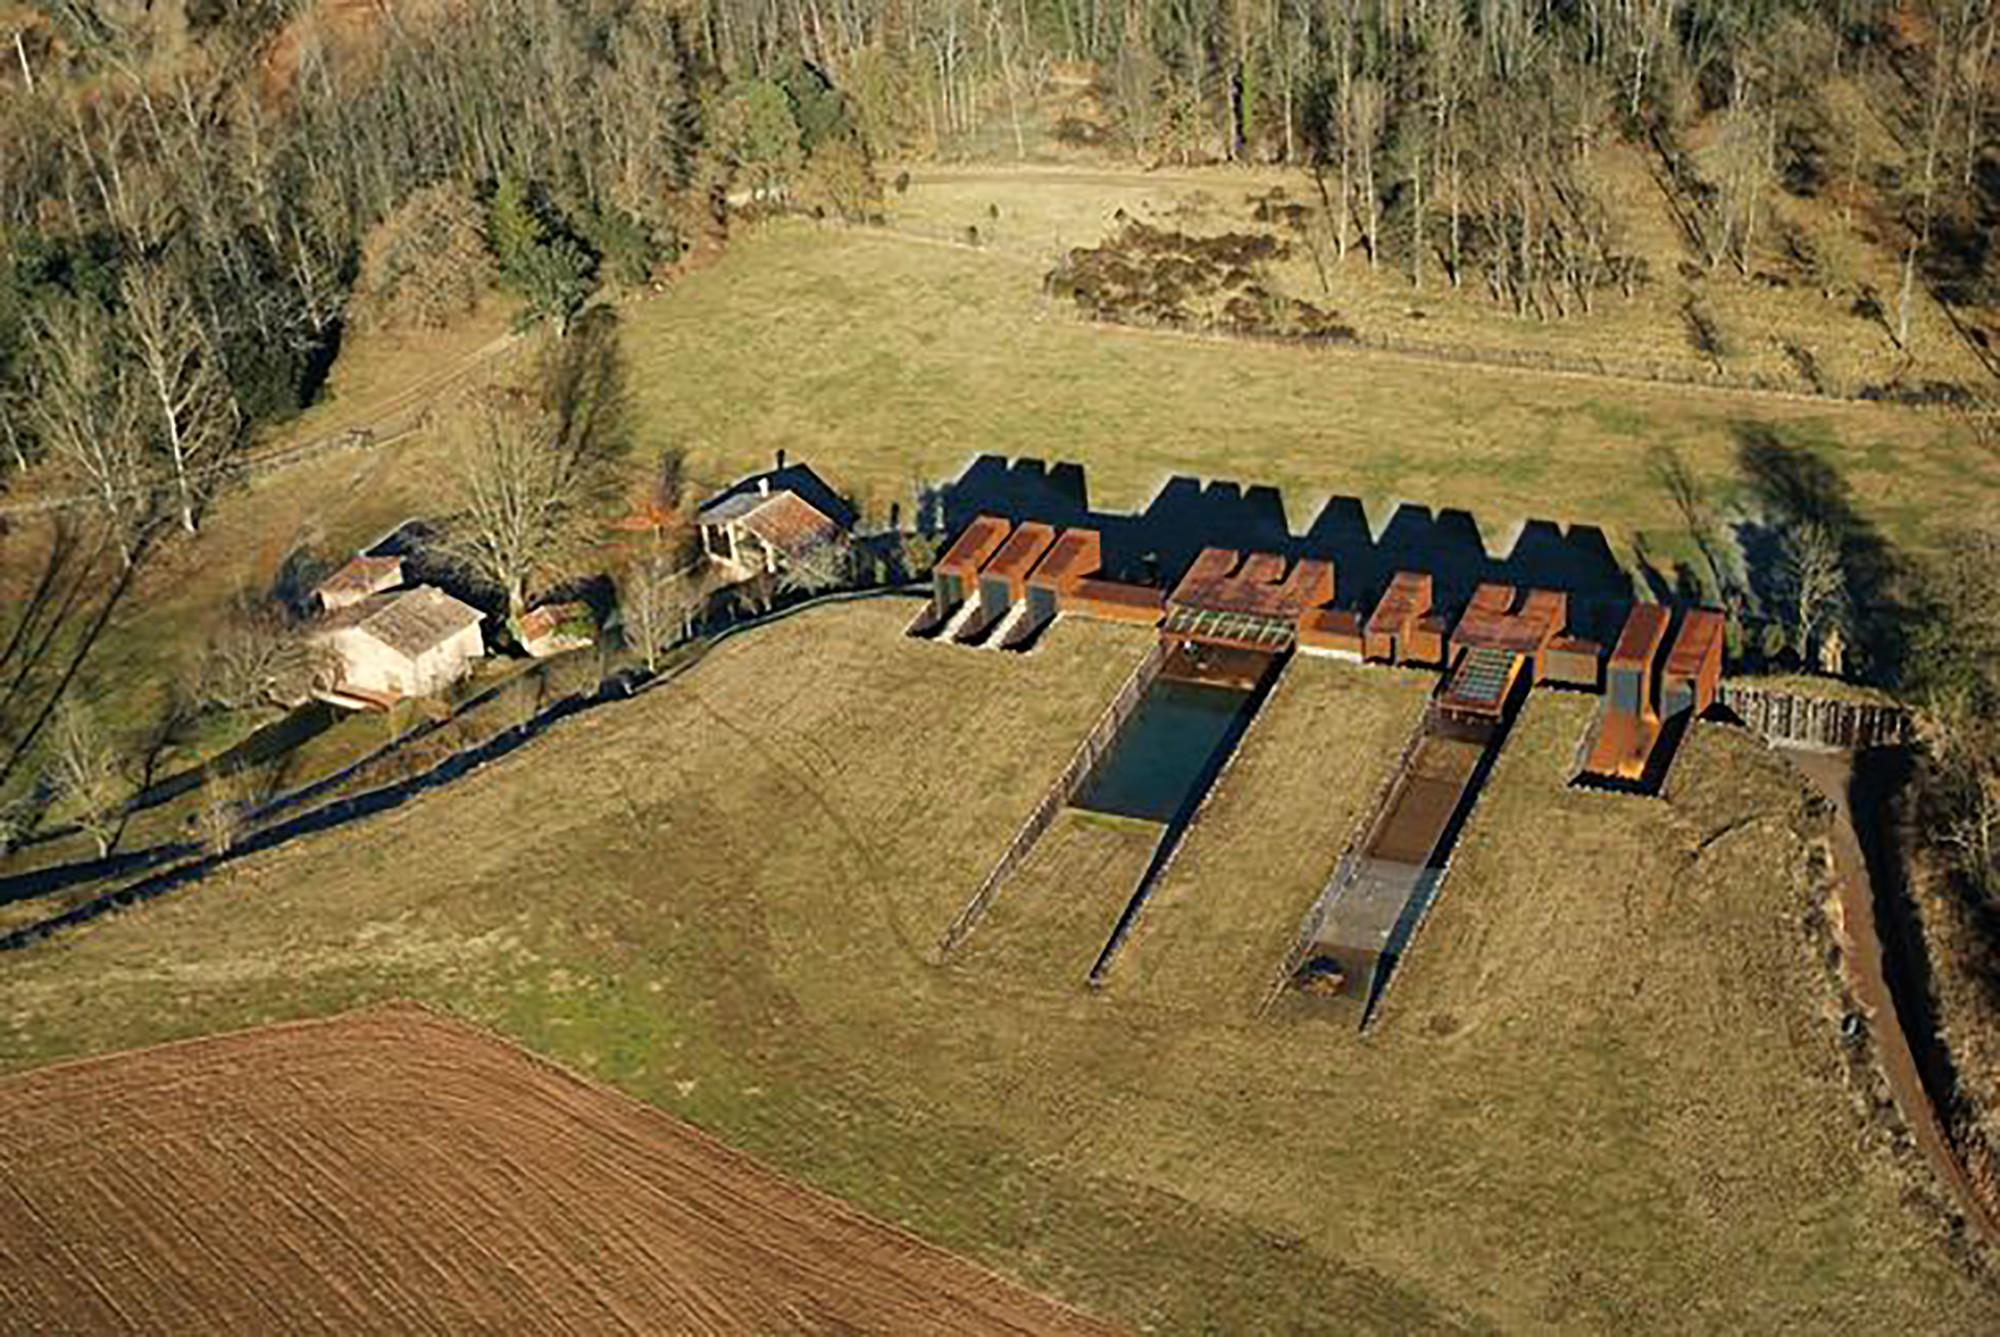 Galeria de casa rural rcr arquitectes 2 for Casa rural mansion terraplen seis